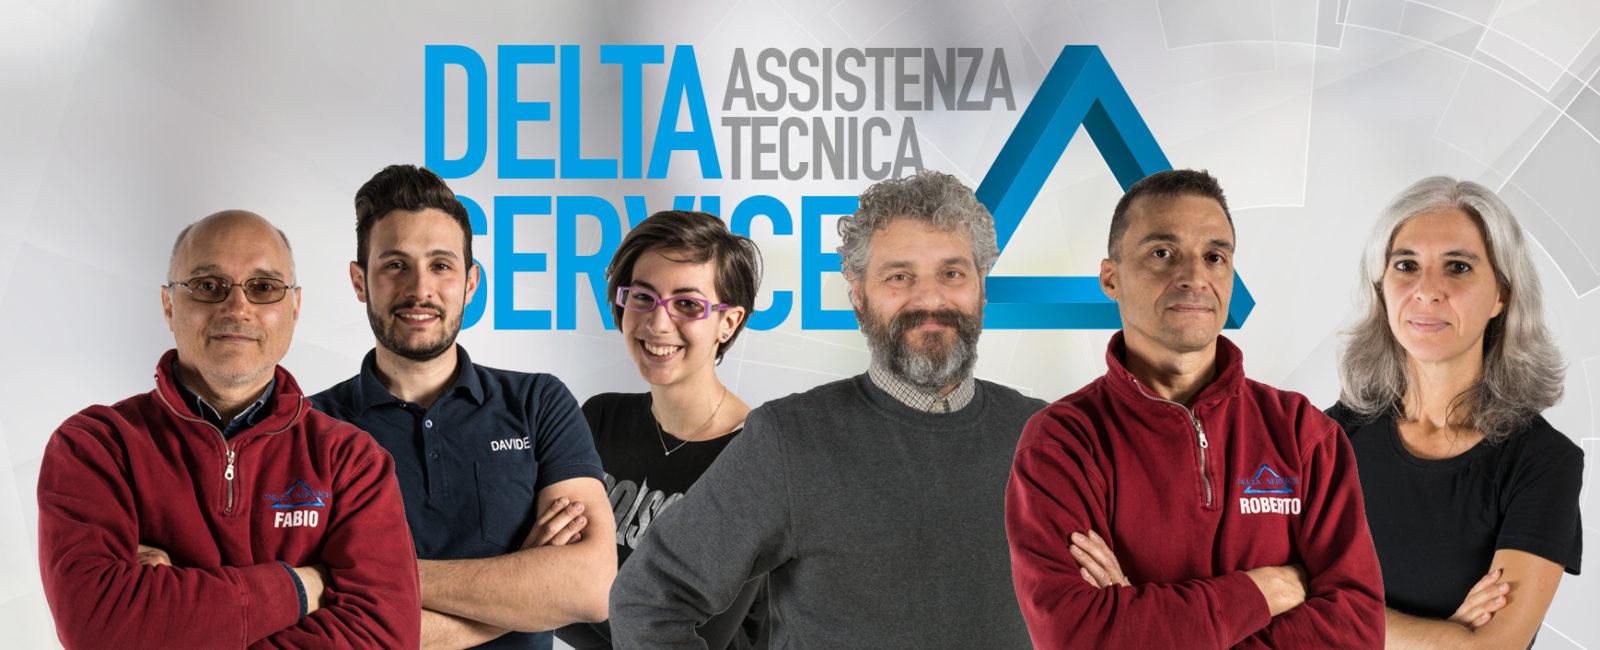 Delta service assistenza caldaie